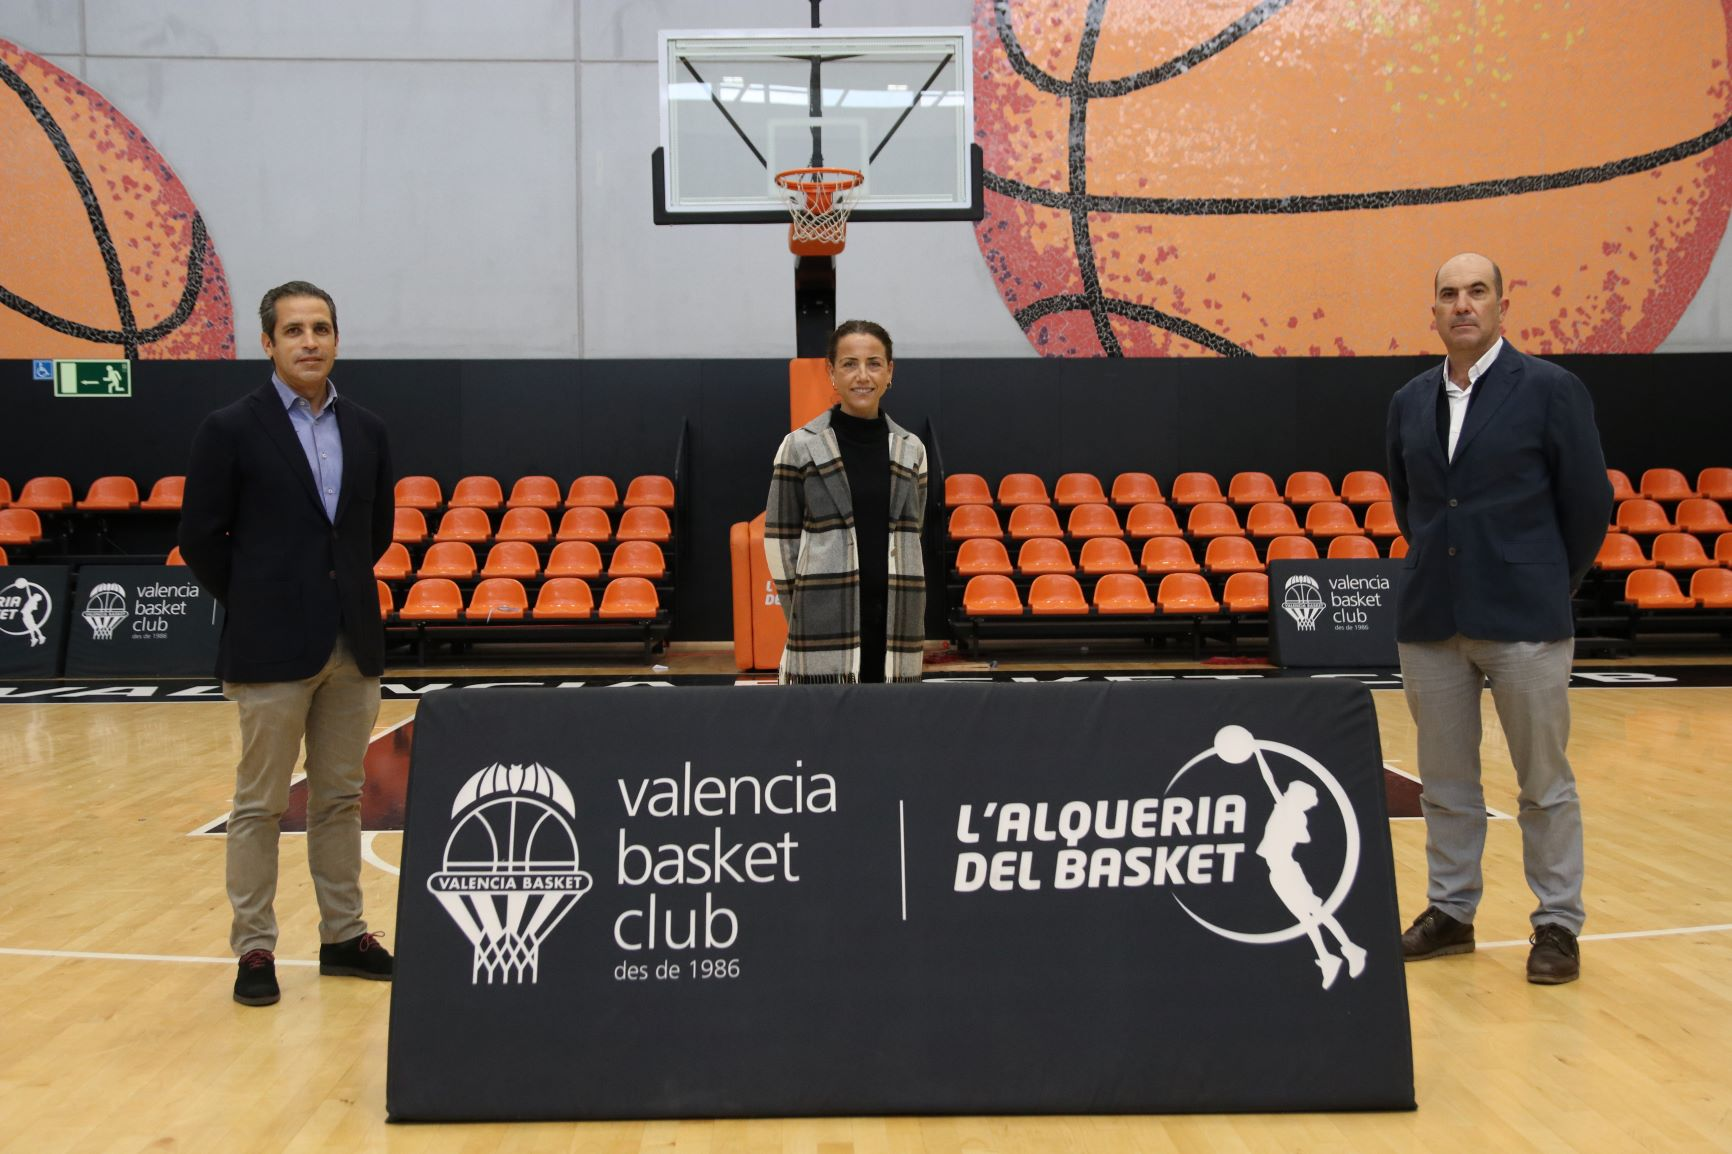 ORRI-Valencia Basket